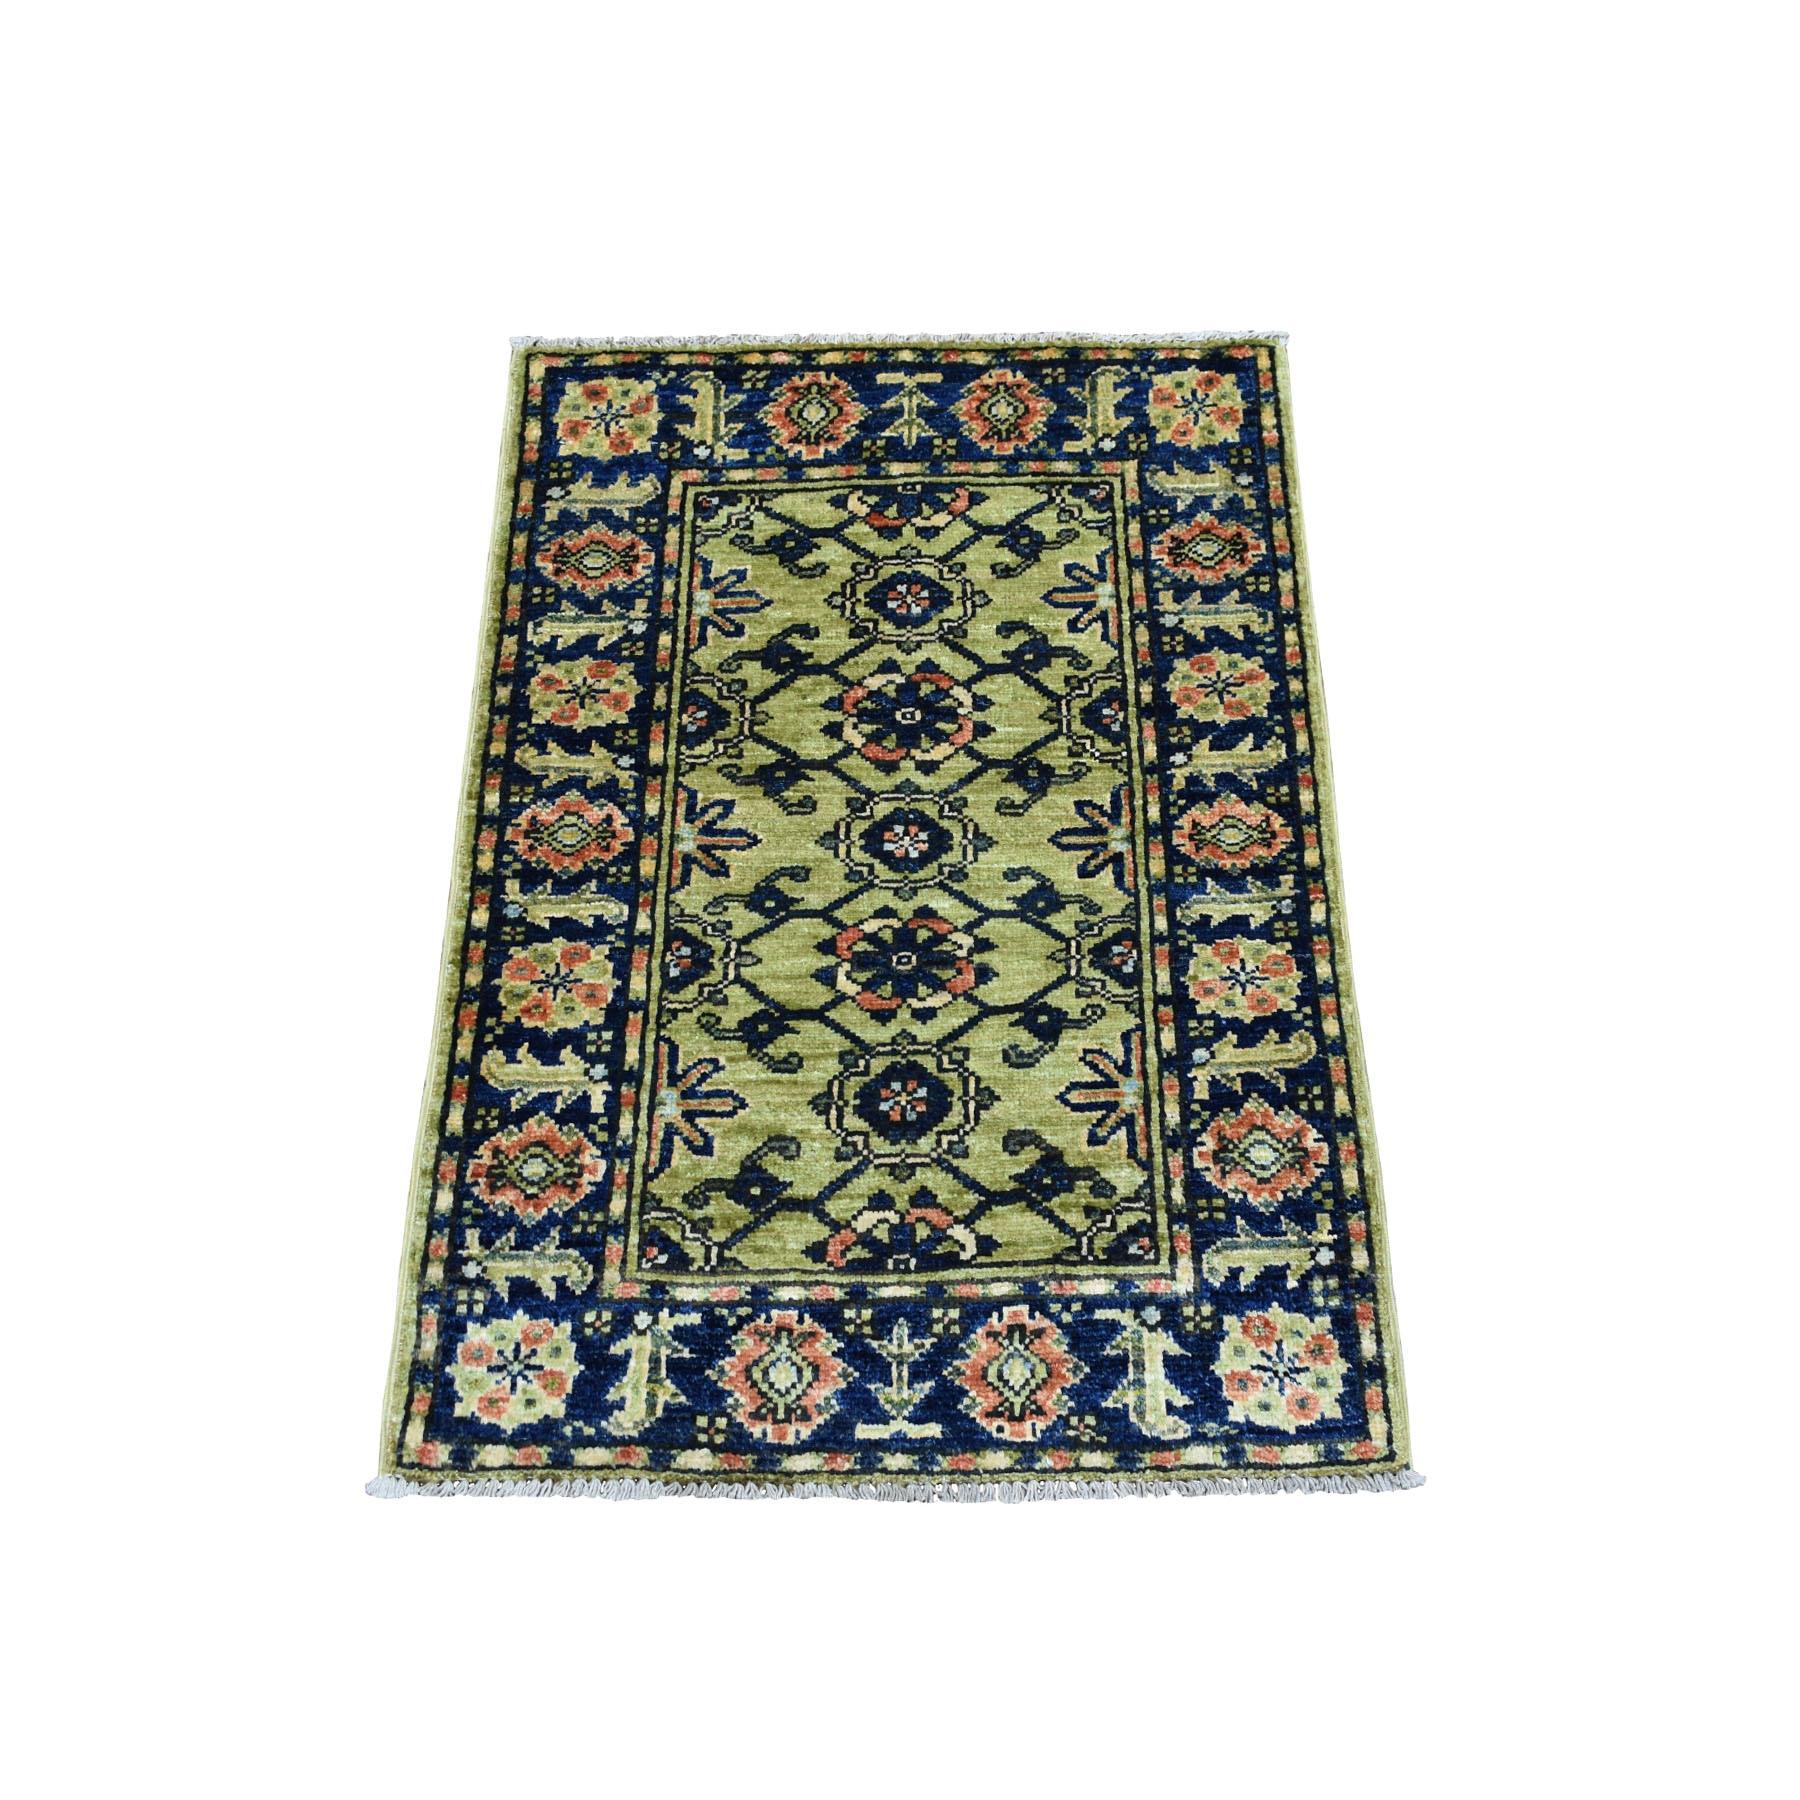 Gold Beige Silk Persian Soft Turkmen Carpet Afghan Rug Runner Small Medium Large